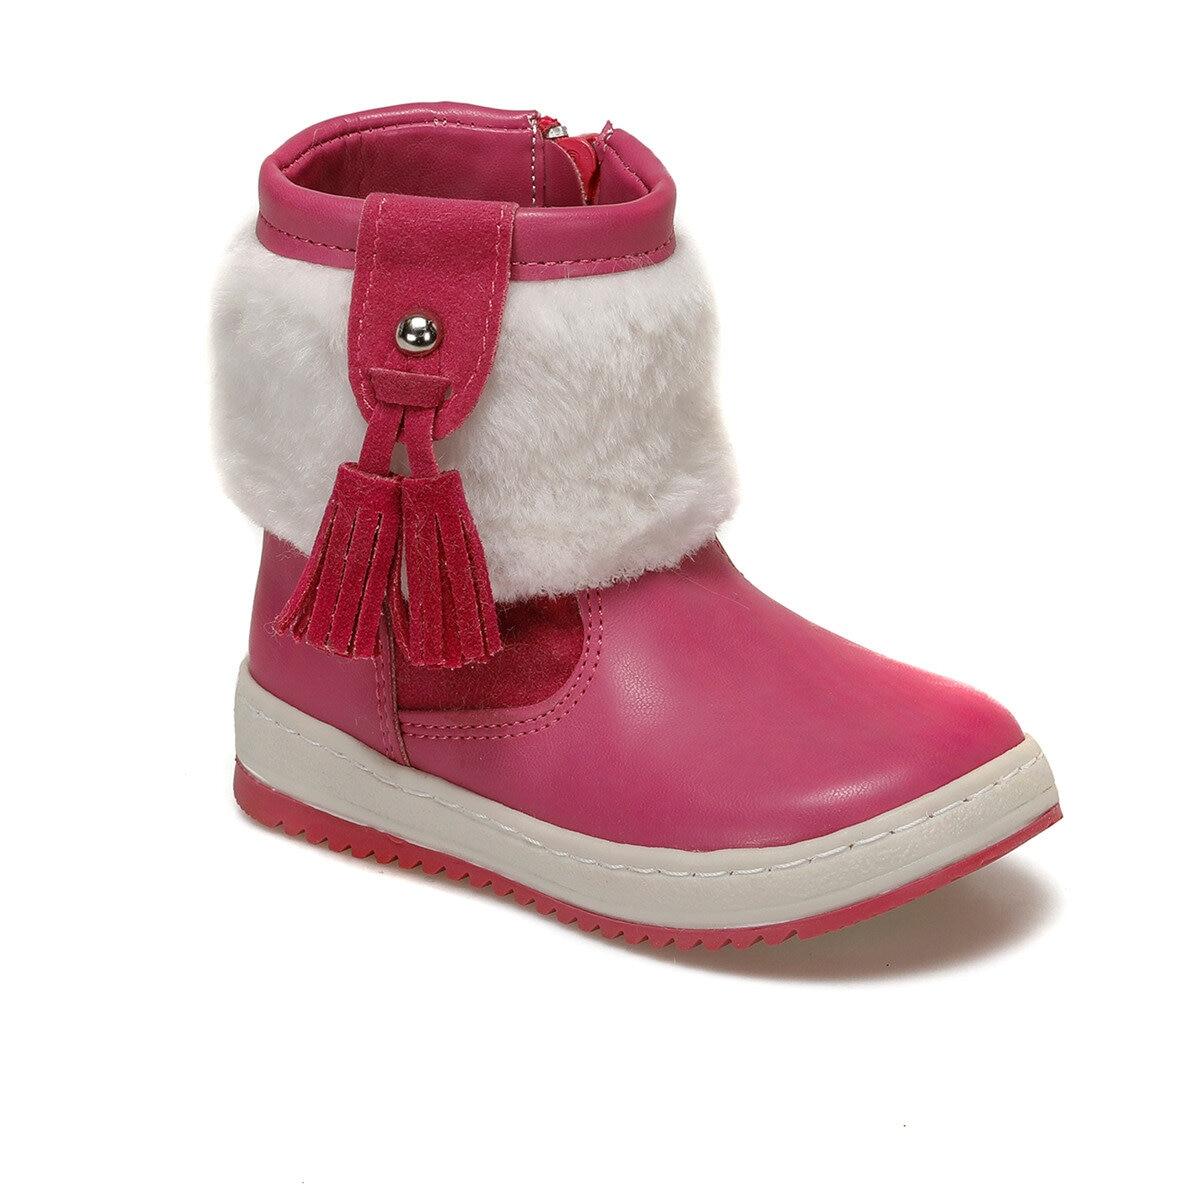 FLO 72.509537.B Fuchsia Female Child Classic Boots Polaris